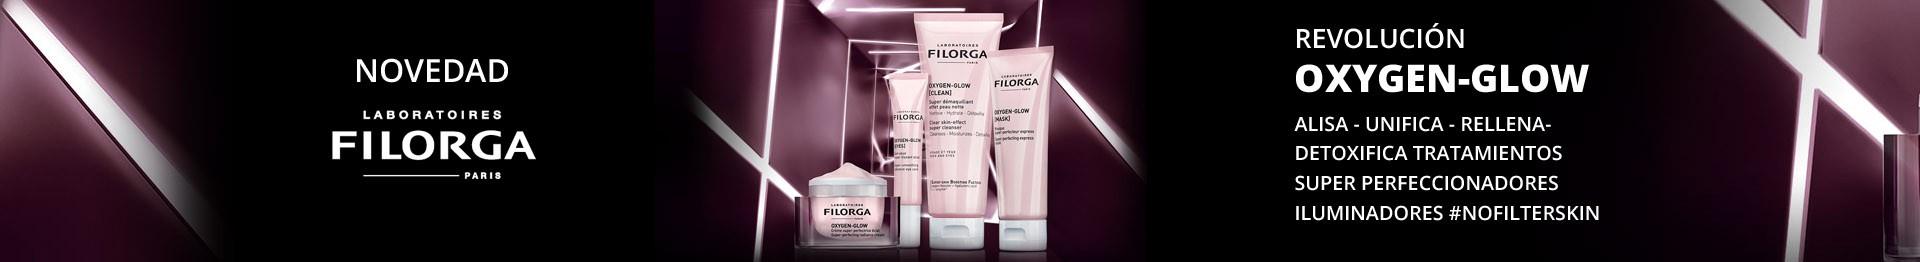 Oxygen-Glow Filorga